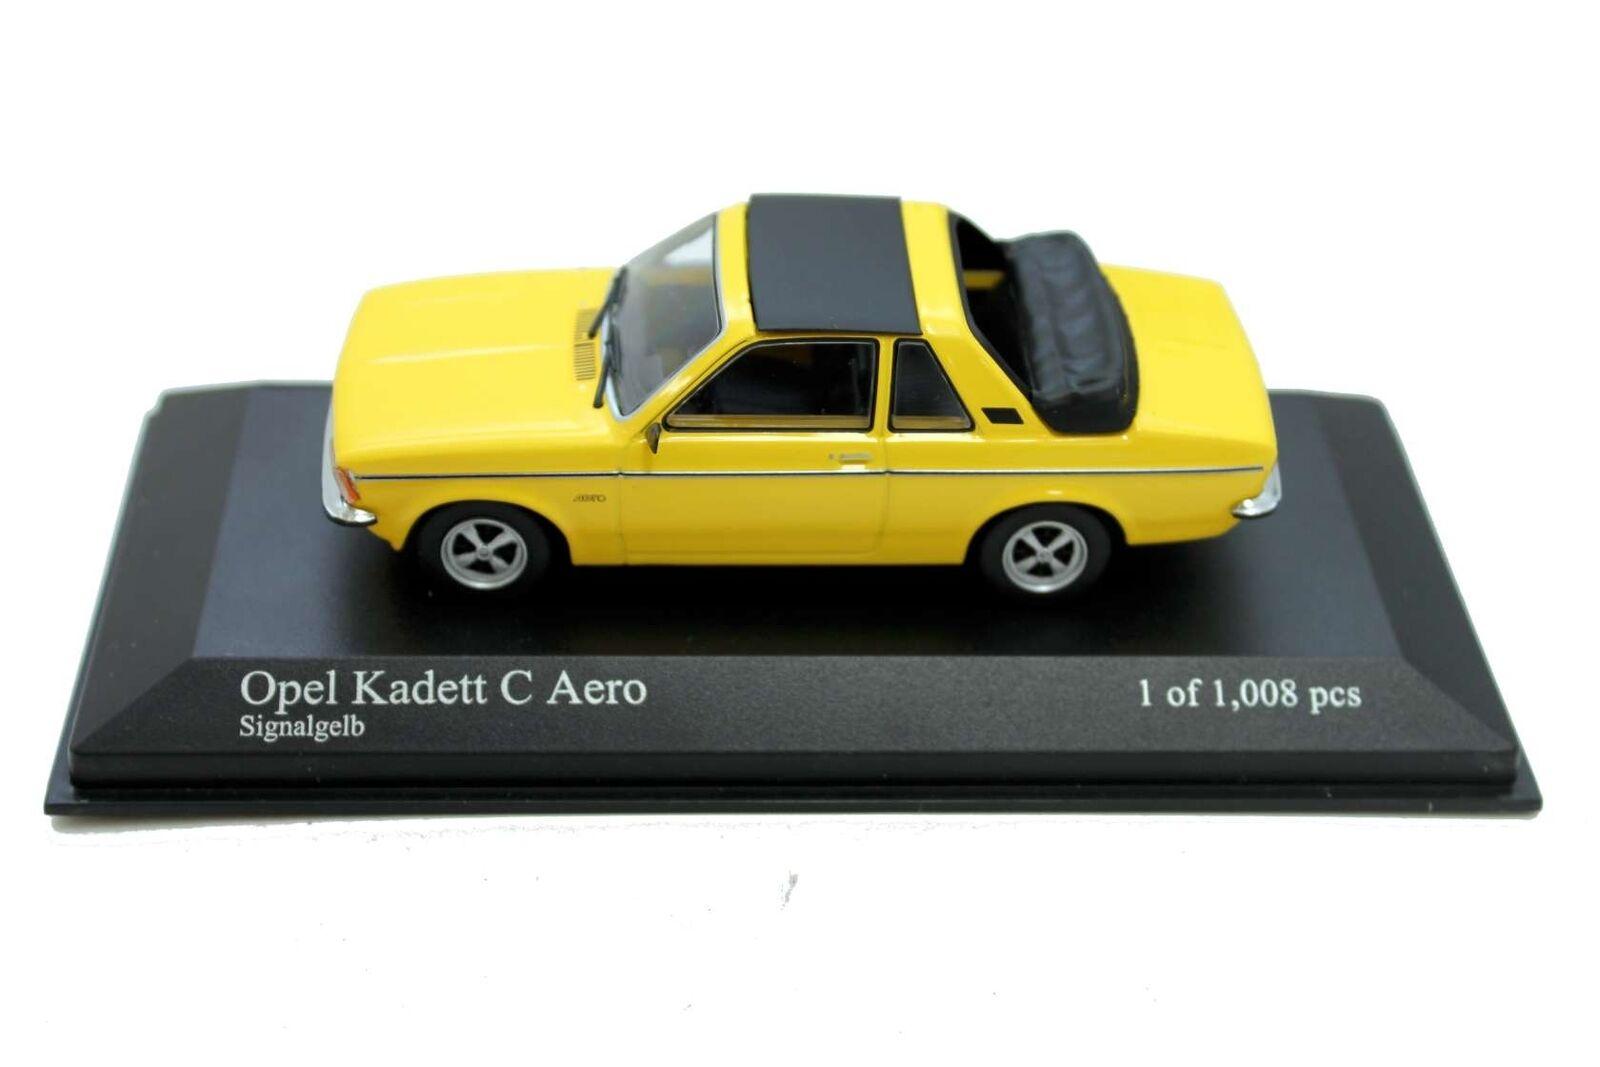 Opel Kadett C Aero 1 43 Model Car Collector's Model Oc11158